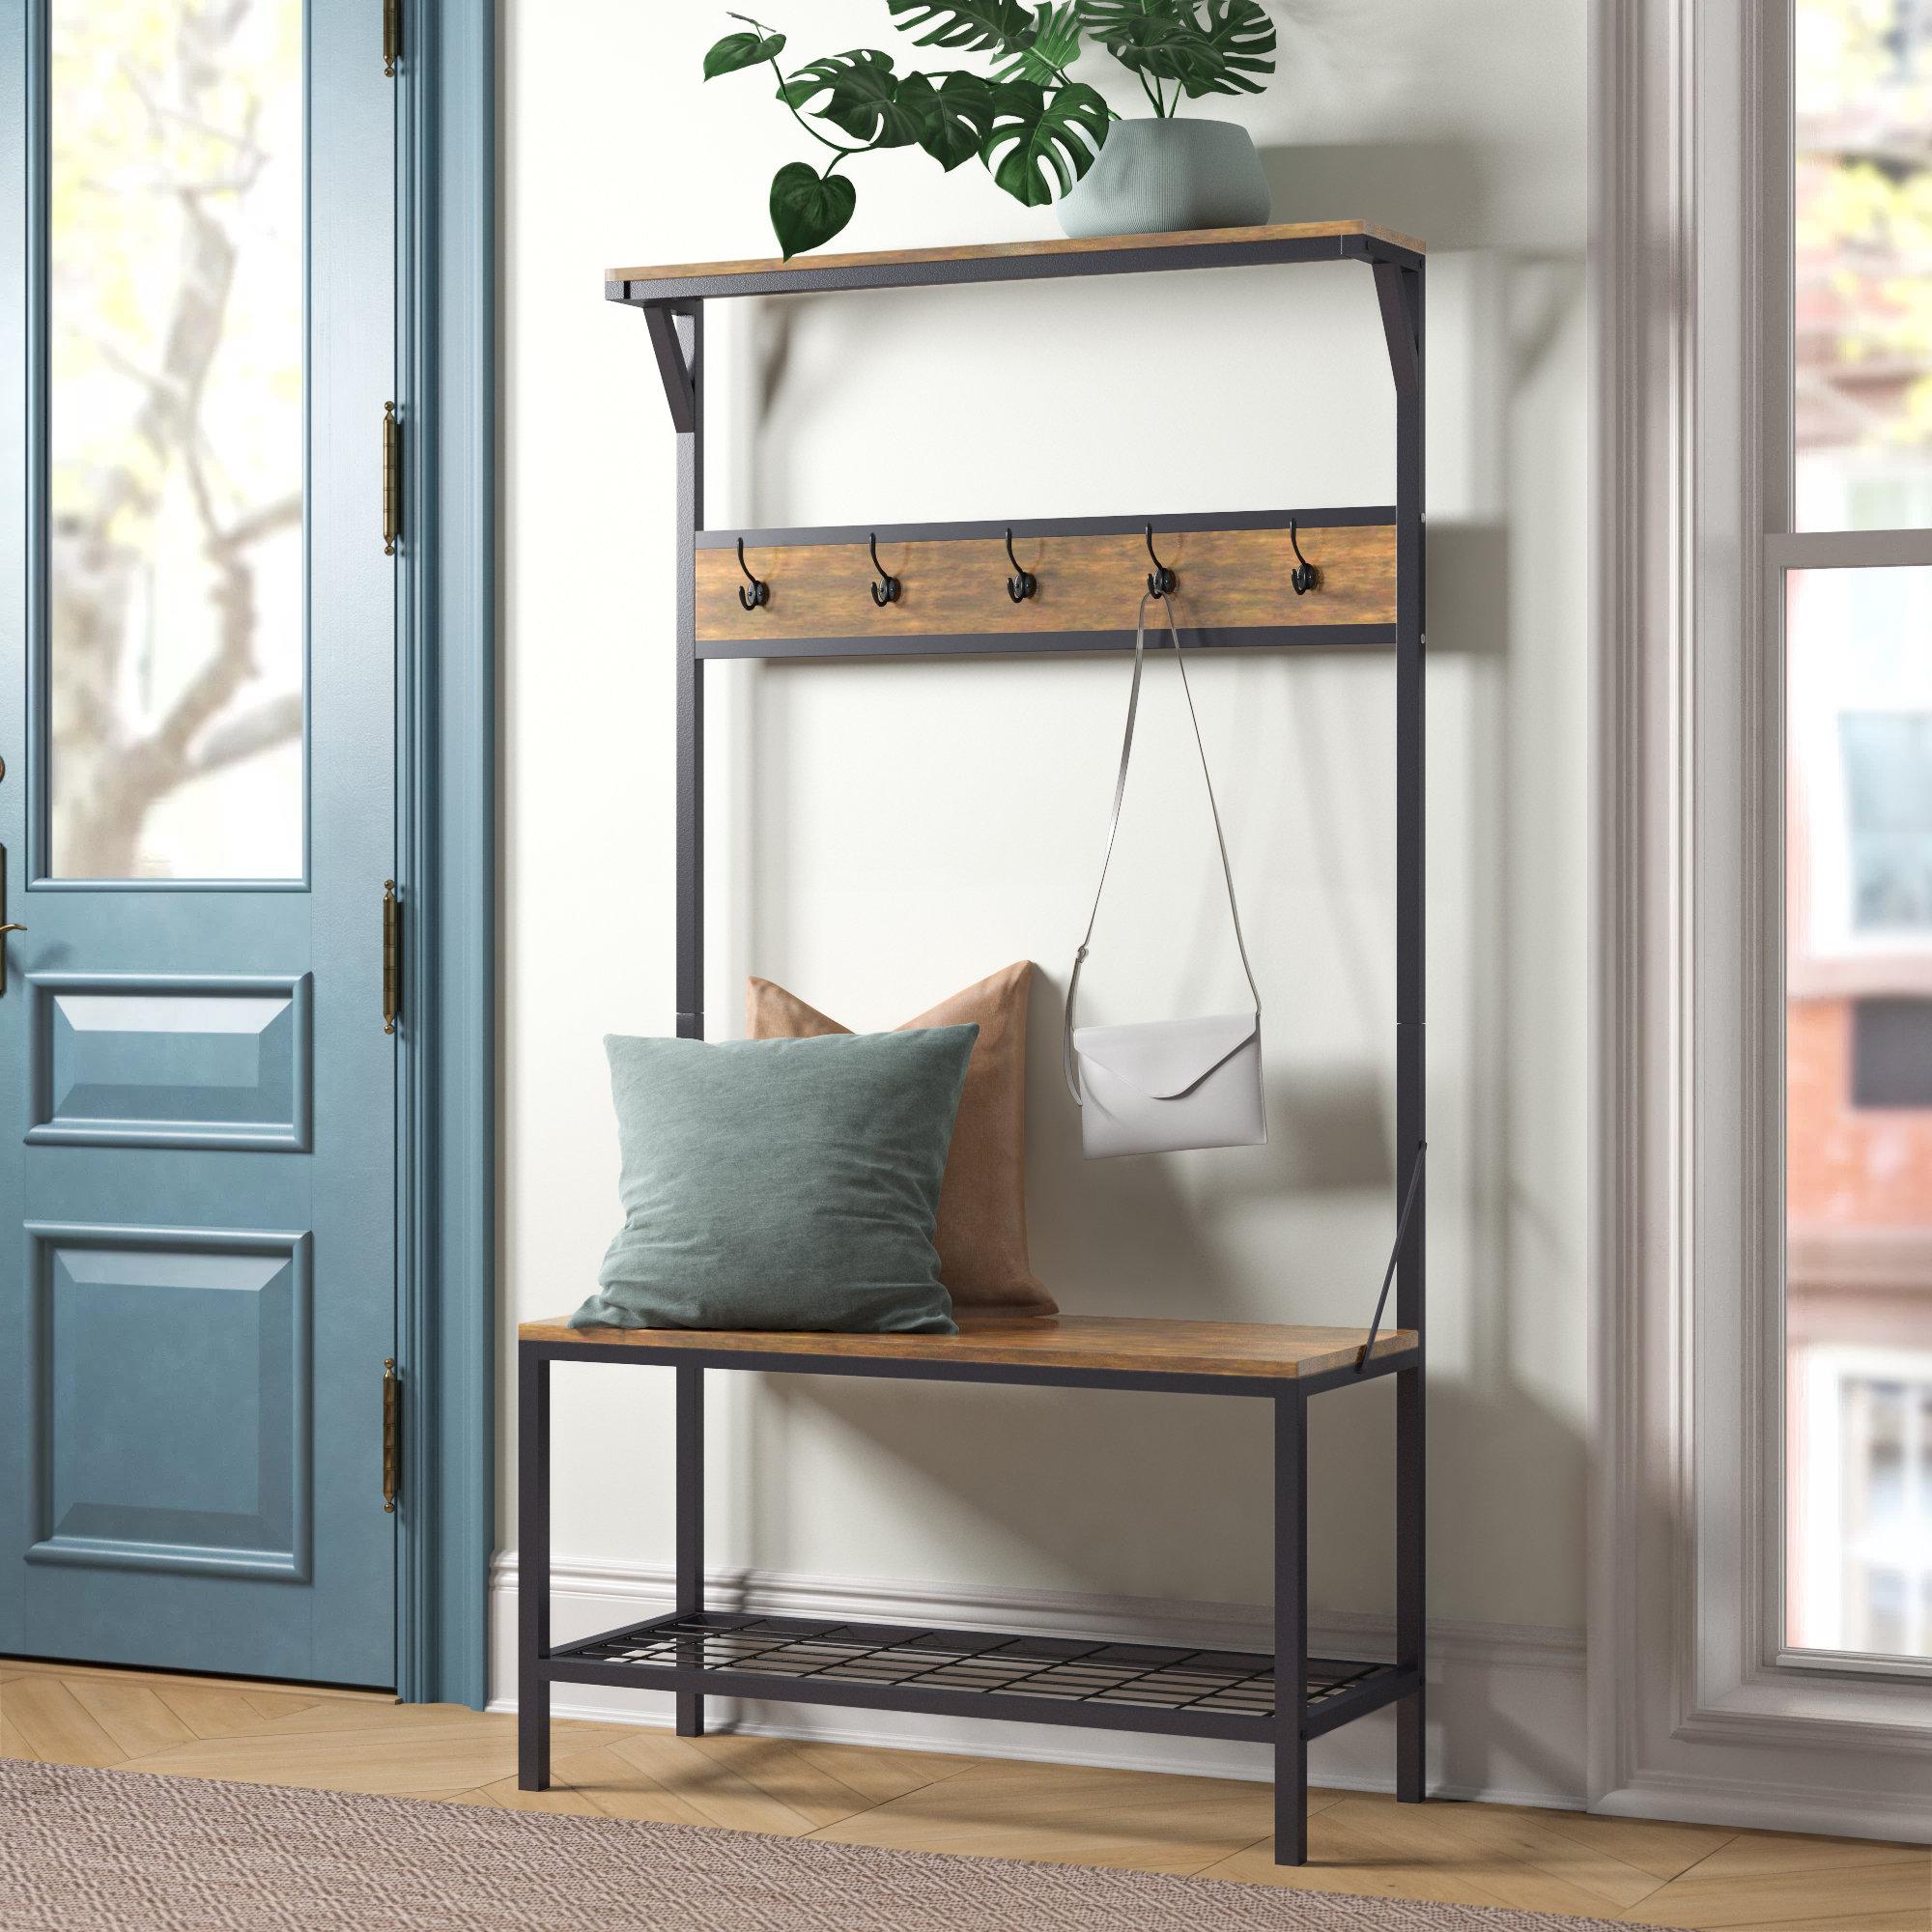 Coat Rack Corner Hall Tree Hat Stand Two Shoe Storage Shelf Hooks Wood Mudroom